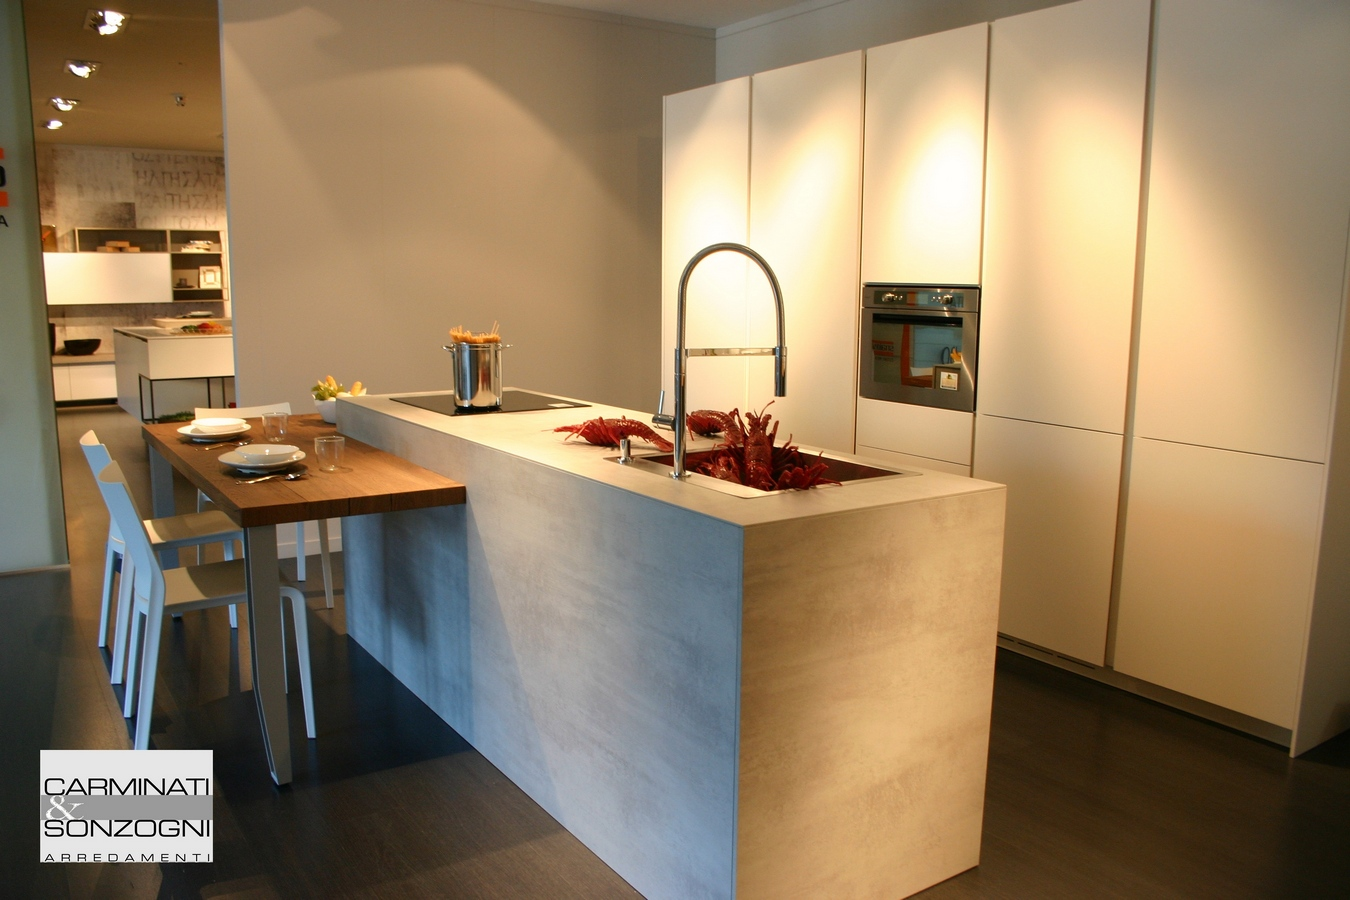 Cucine da esposizione a prezzi scontaticarminati e sonzogni - Cucina in casa ...